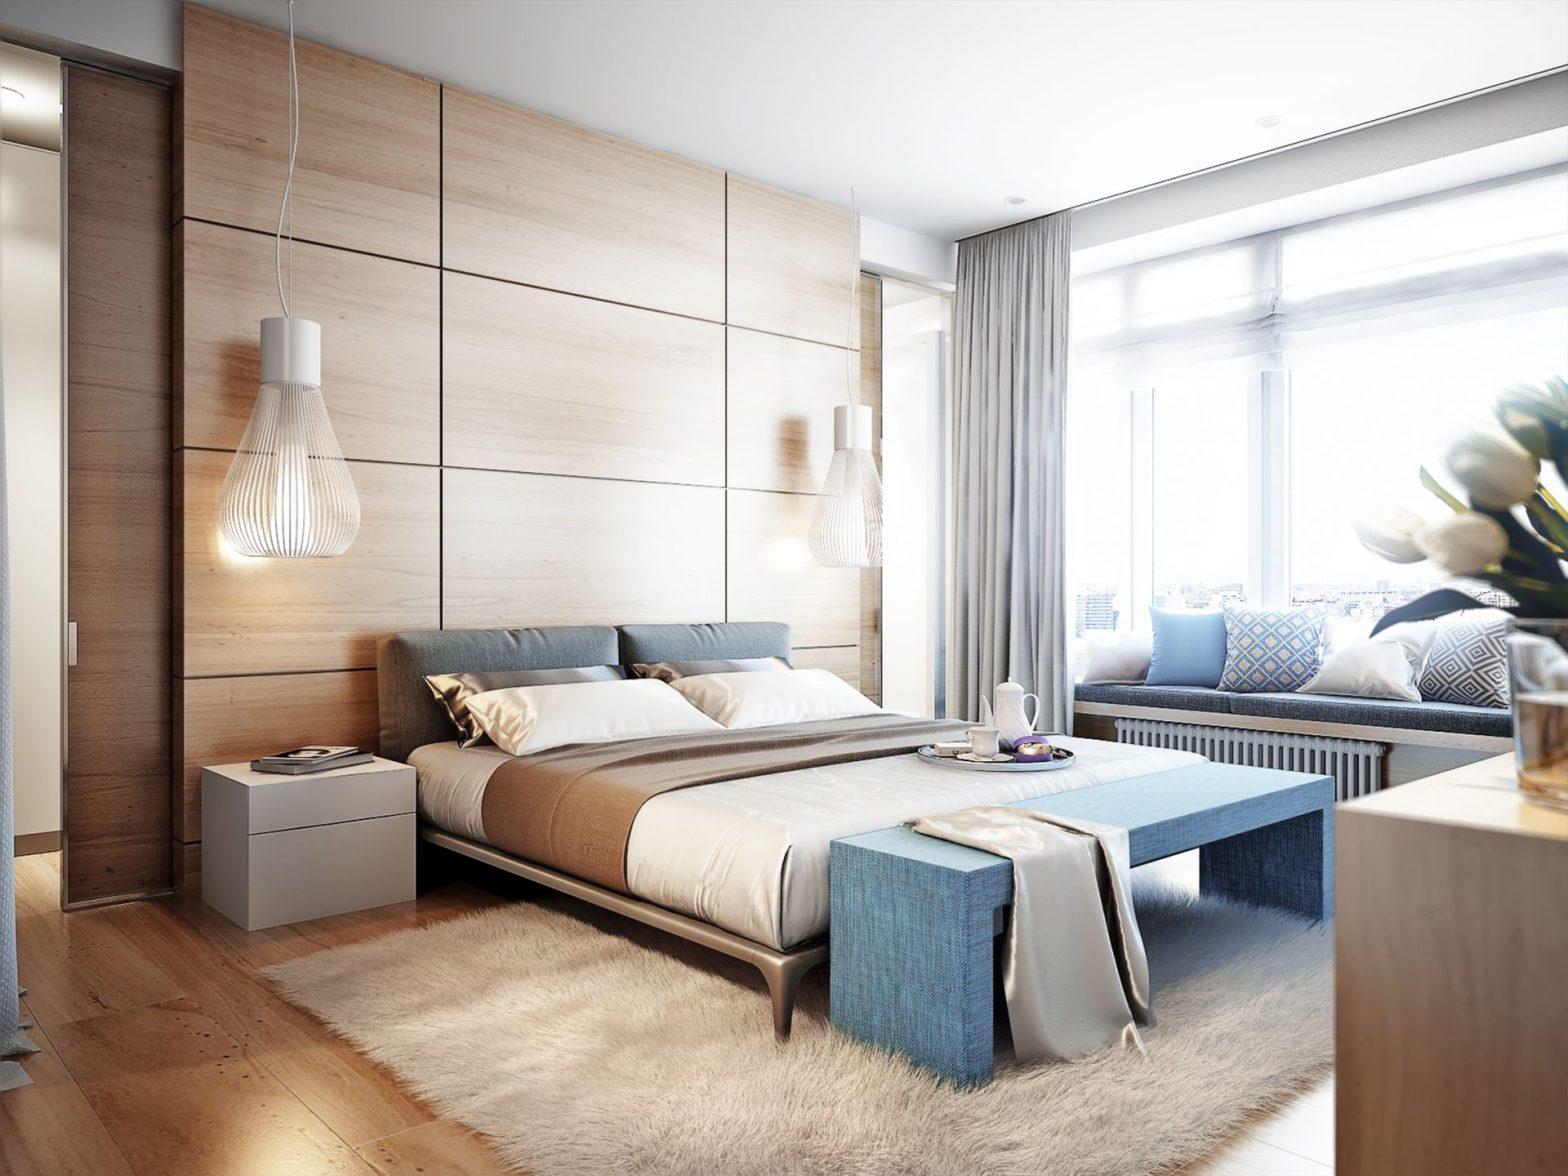 DIY: חדר שינה כמו בבית מלון